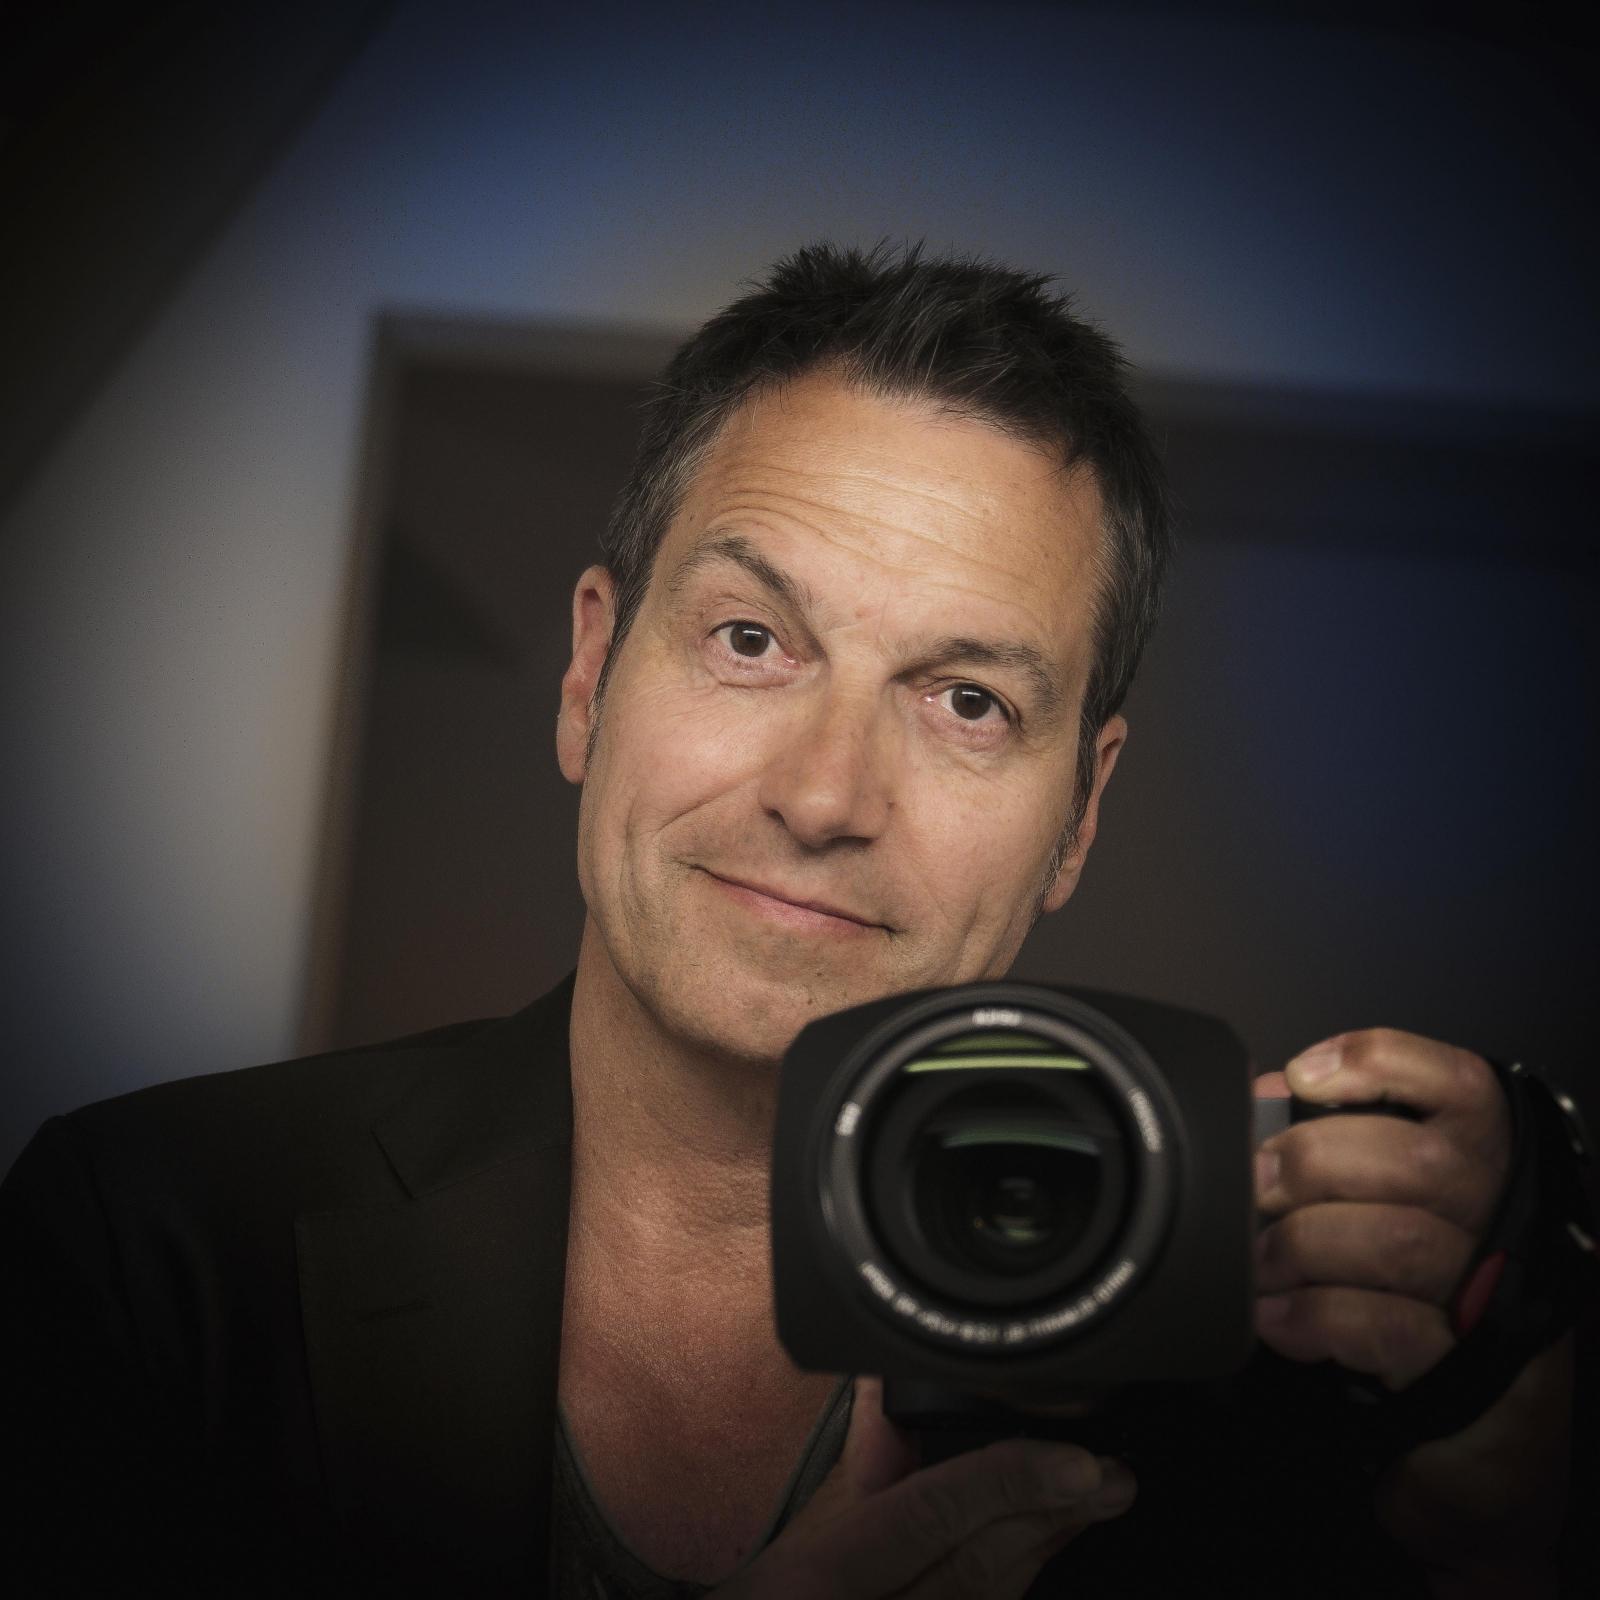 Dieter Nuhr Fotografien Galerie Obrist